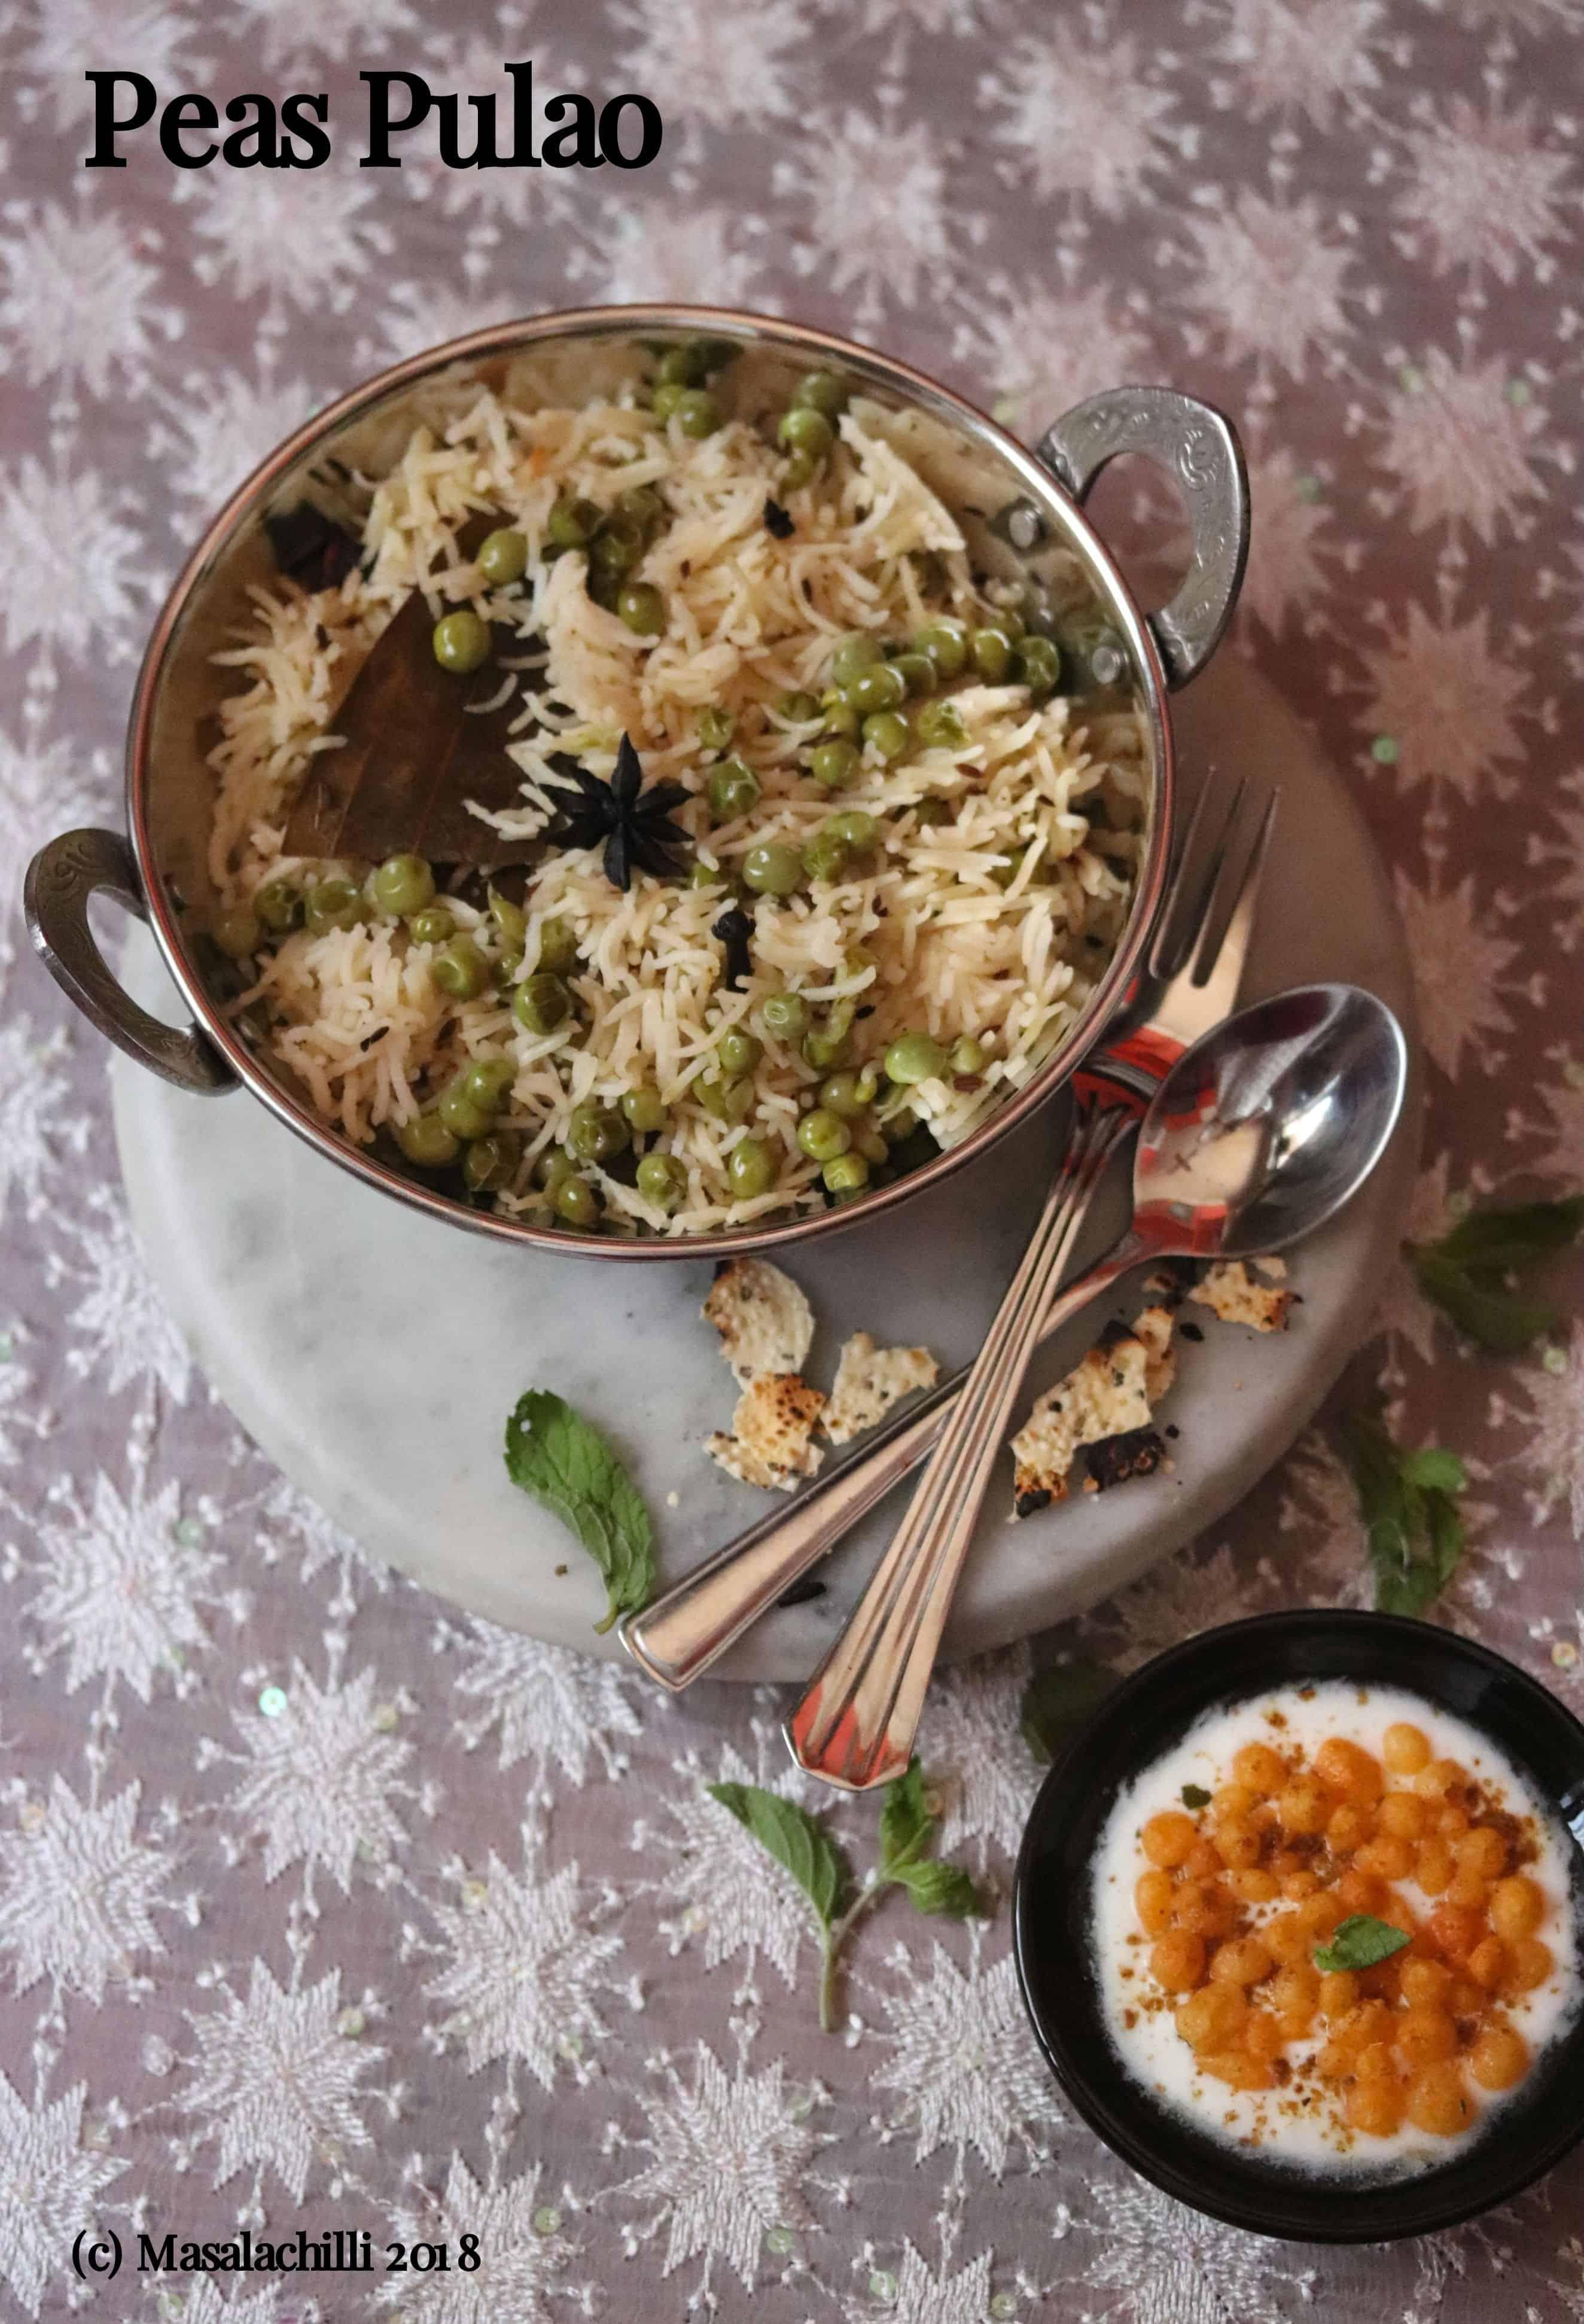 Green Peas Pulao / Matar Pulao / How to make Matar Pulao in Pressure Cooker